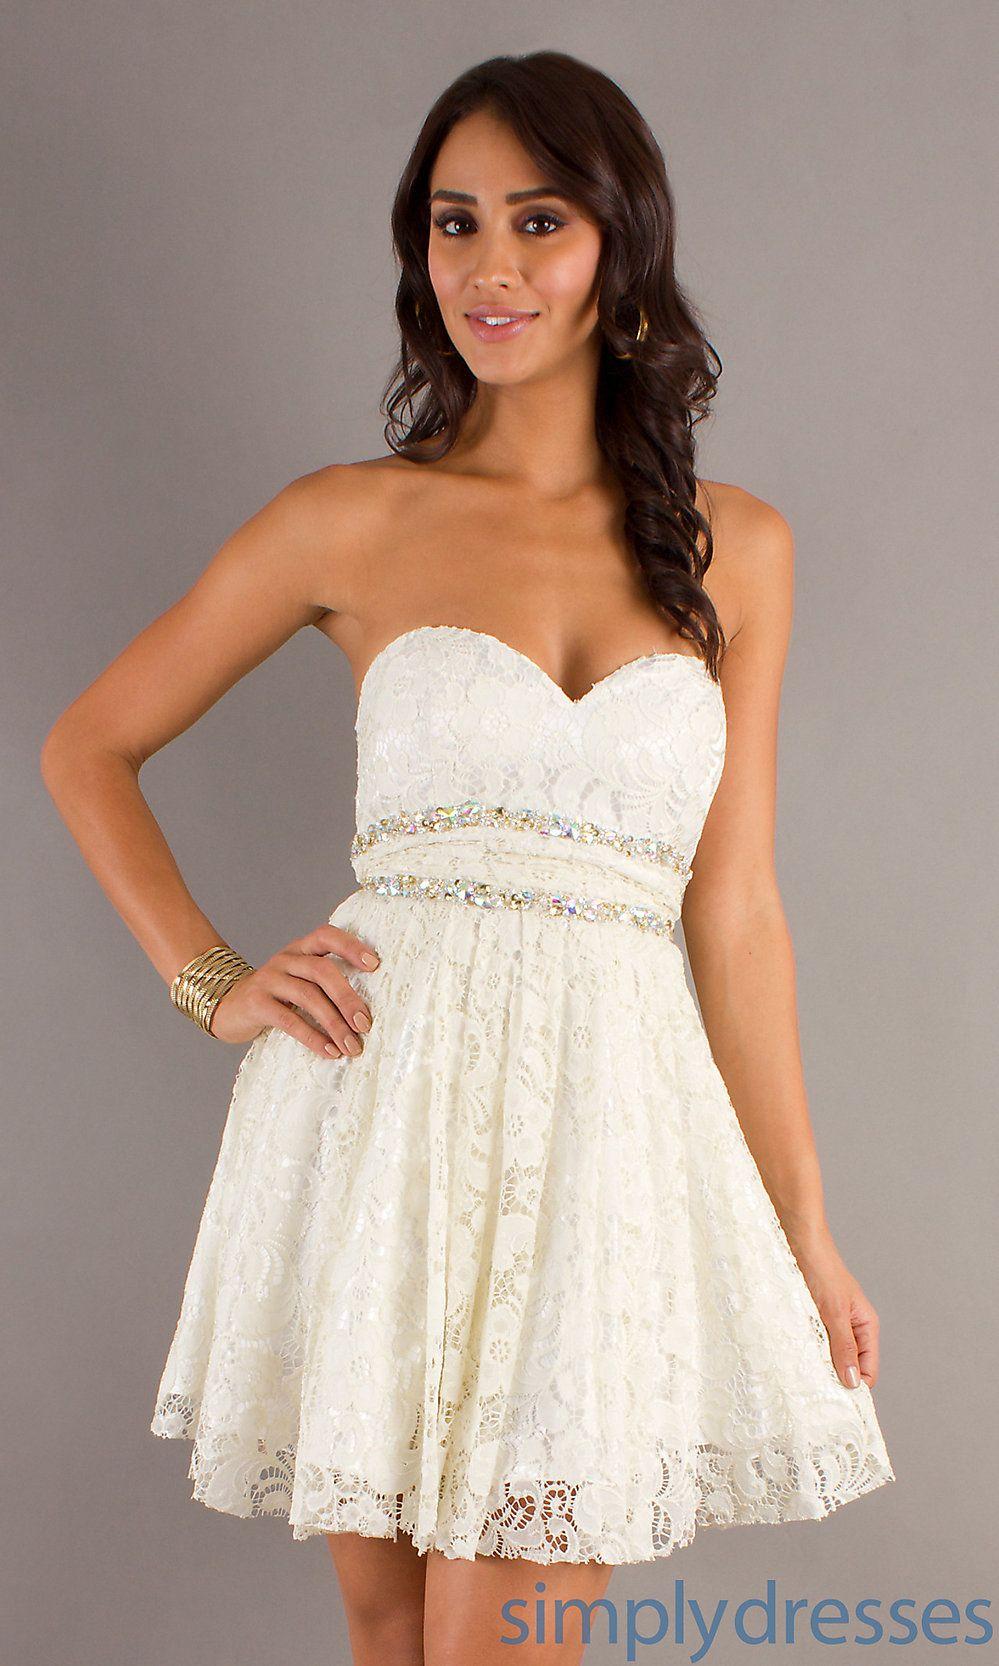 Wedding White Lace Short Dress white lace short dress photo album fashion trends and models images of models